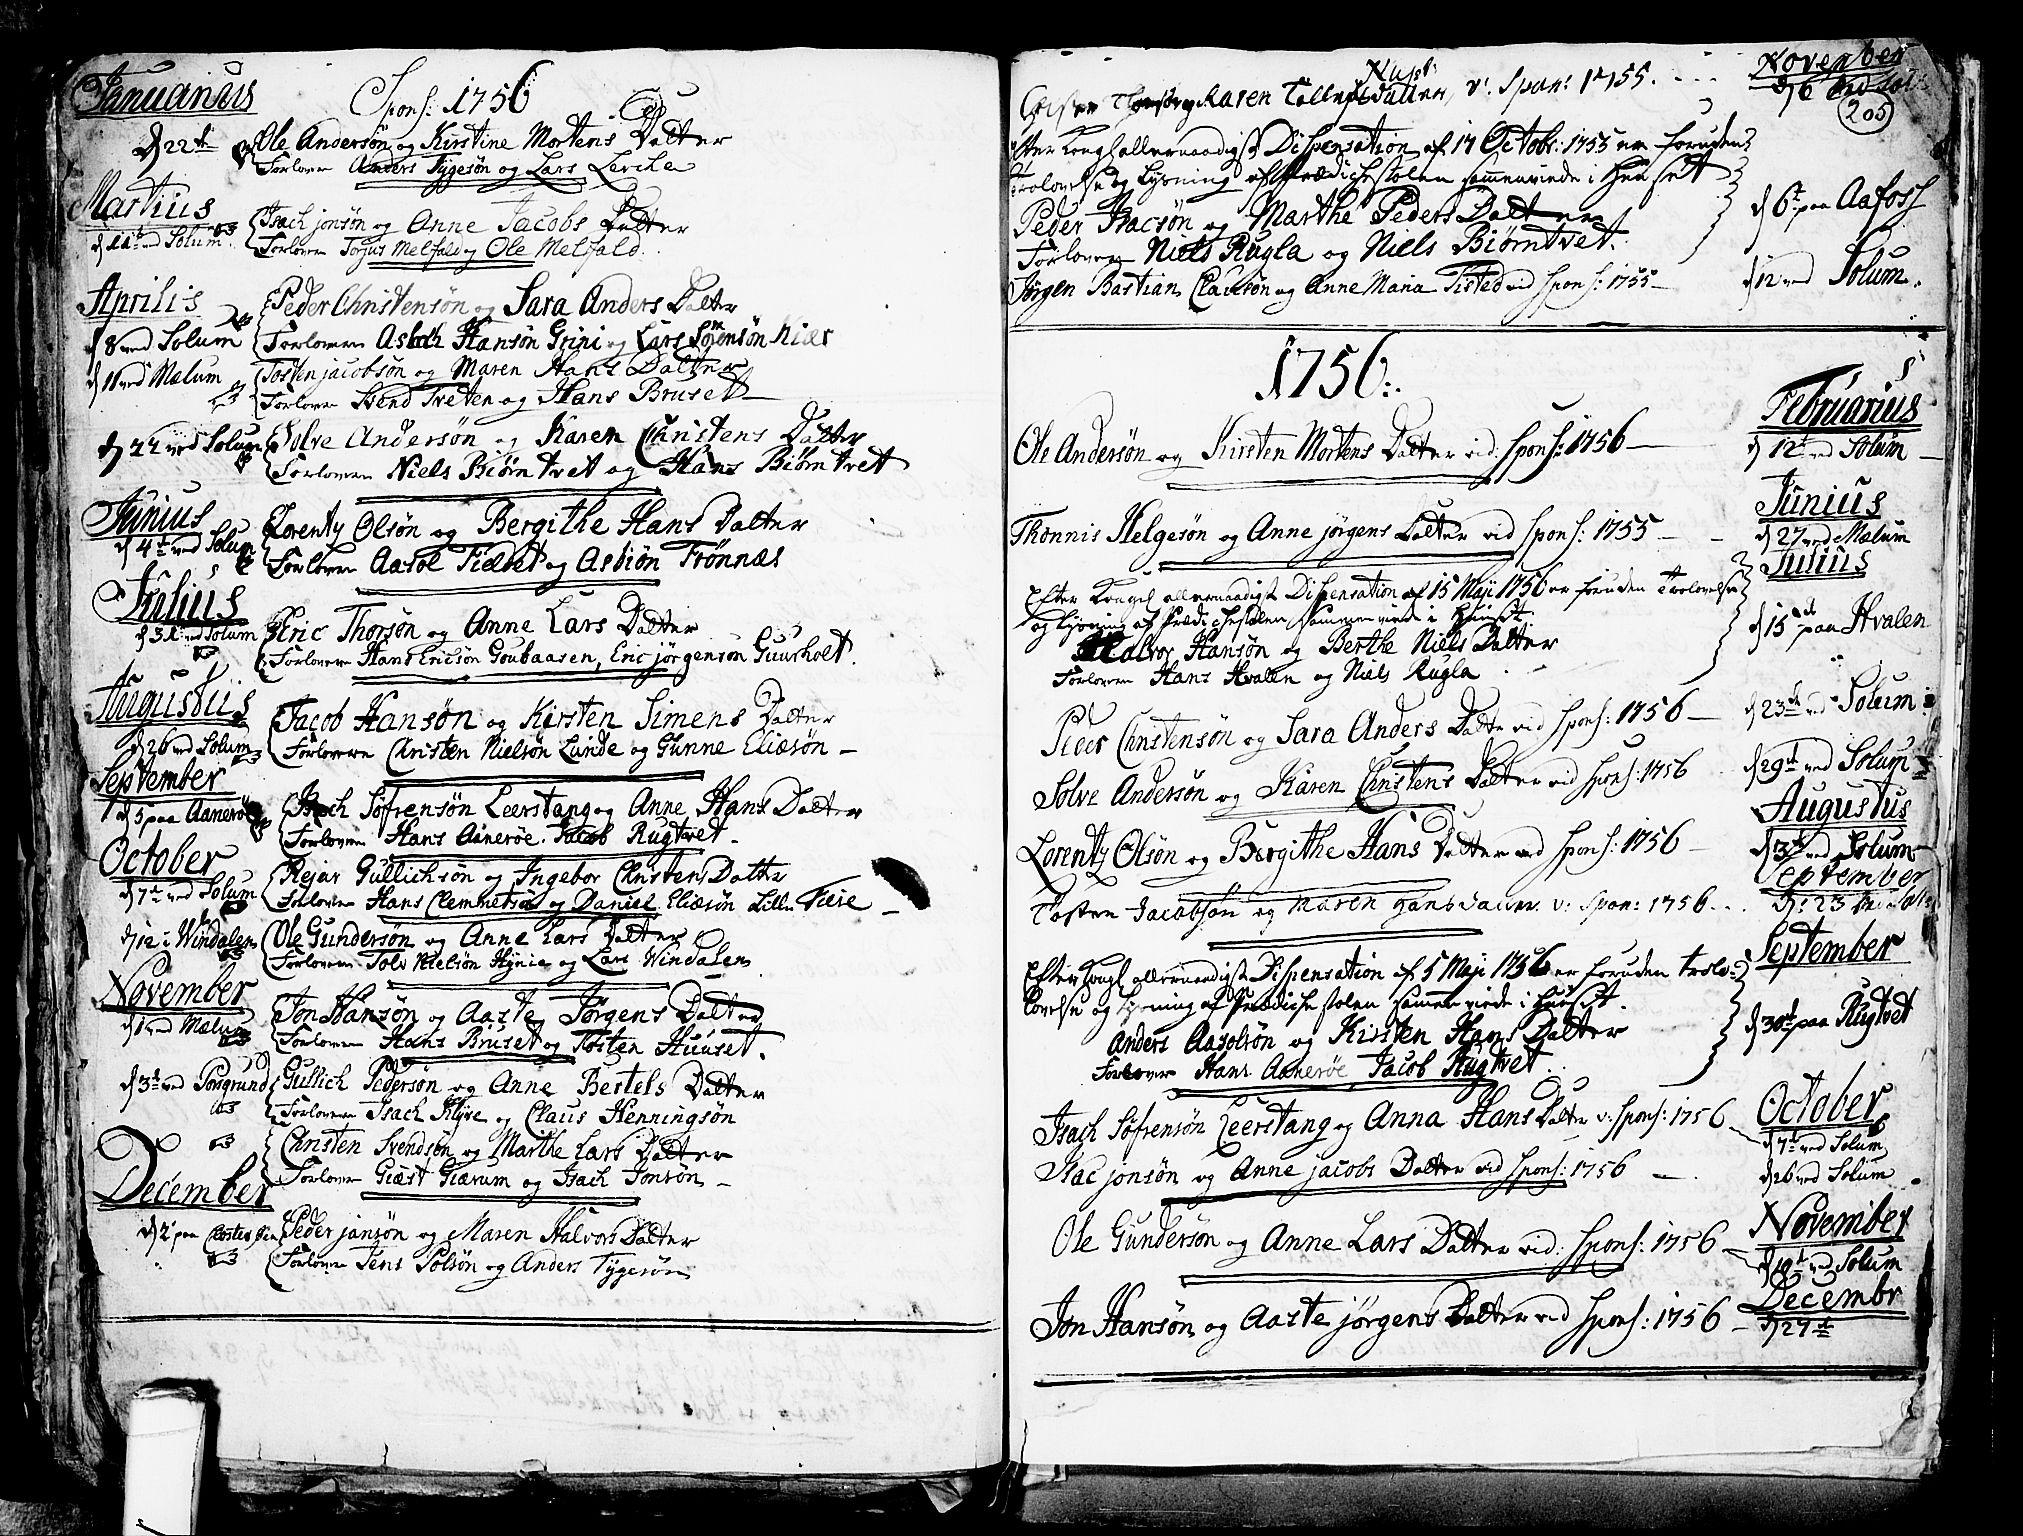 SAKO, Solum kirkebøker, F/Fa/L0002: Ministerialbok nr. I 2, 1713-1761, s. 205